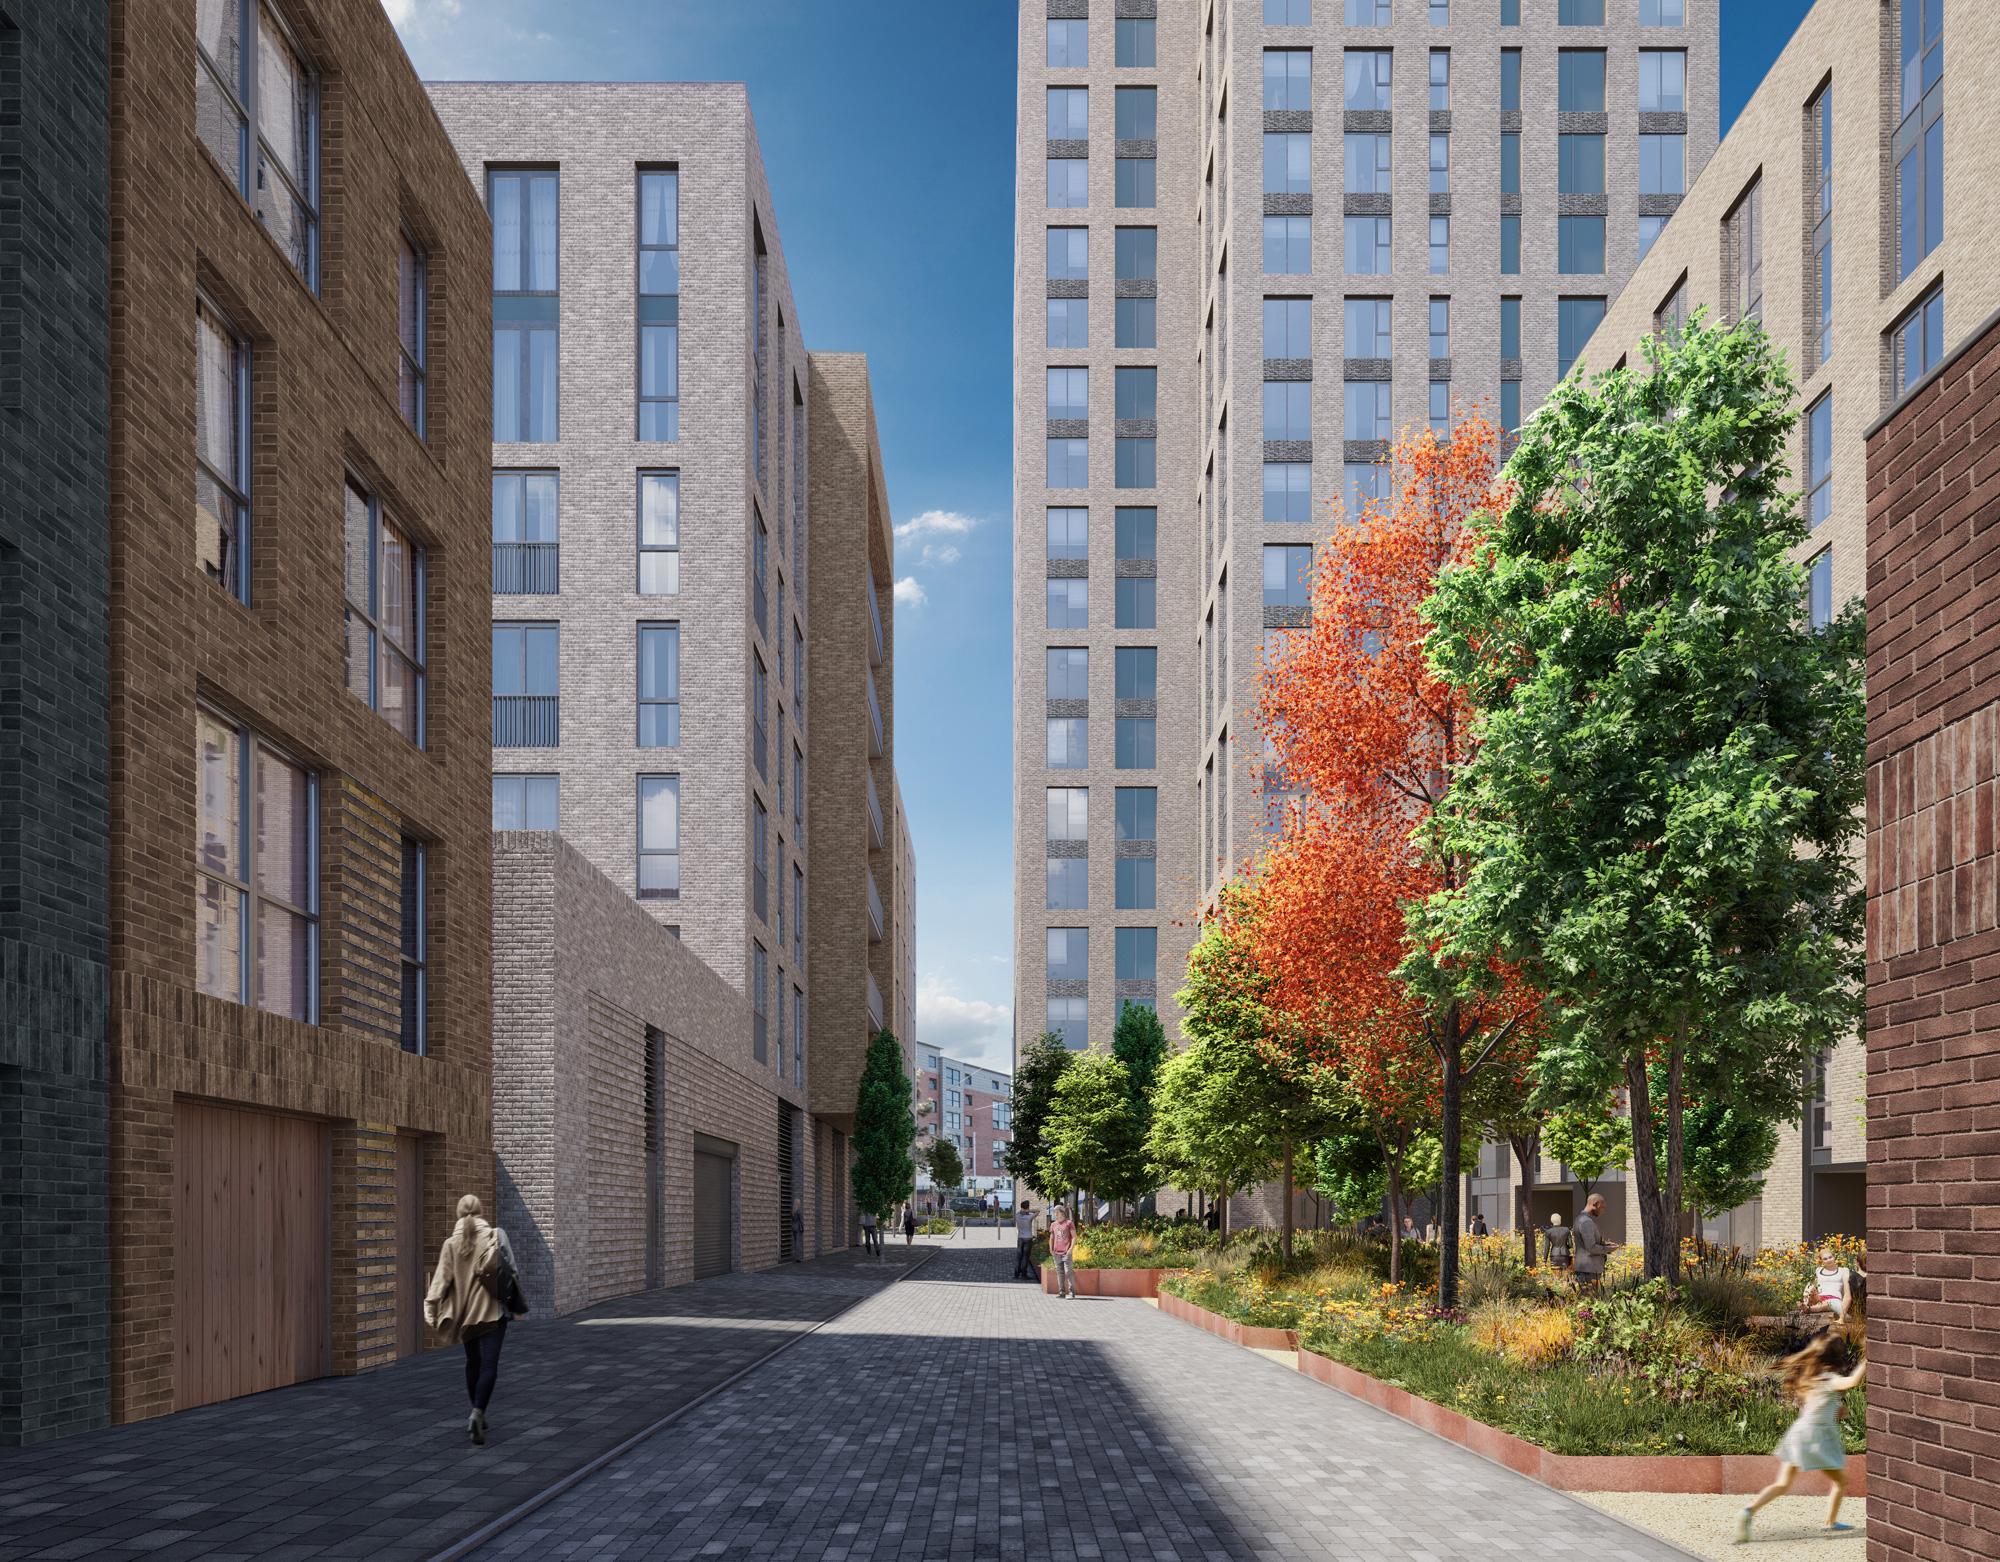 CODA-Architecture-Hoyle-Street-1